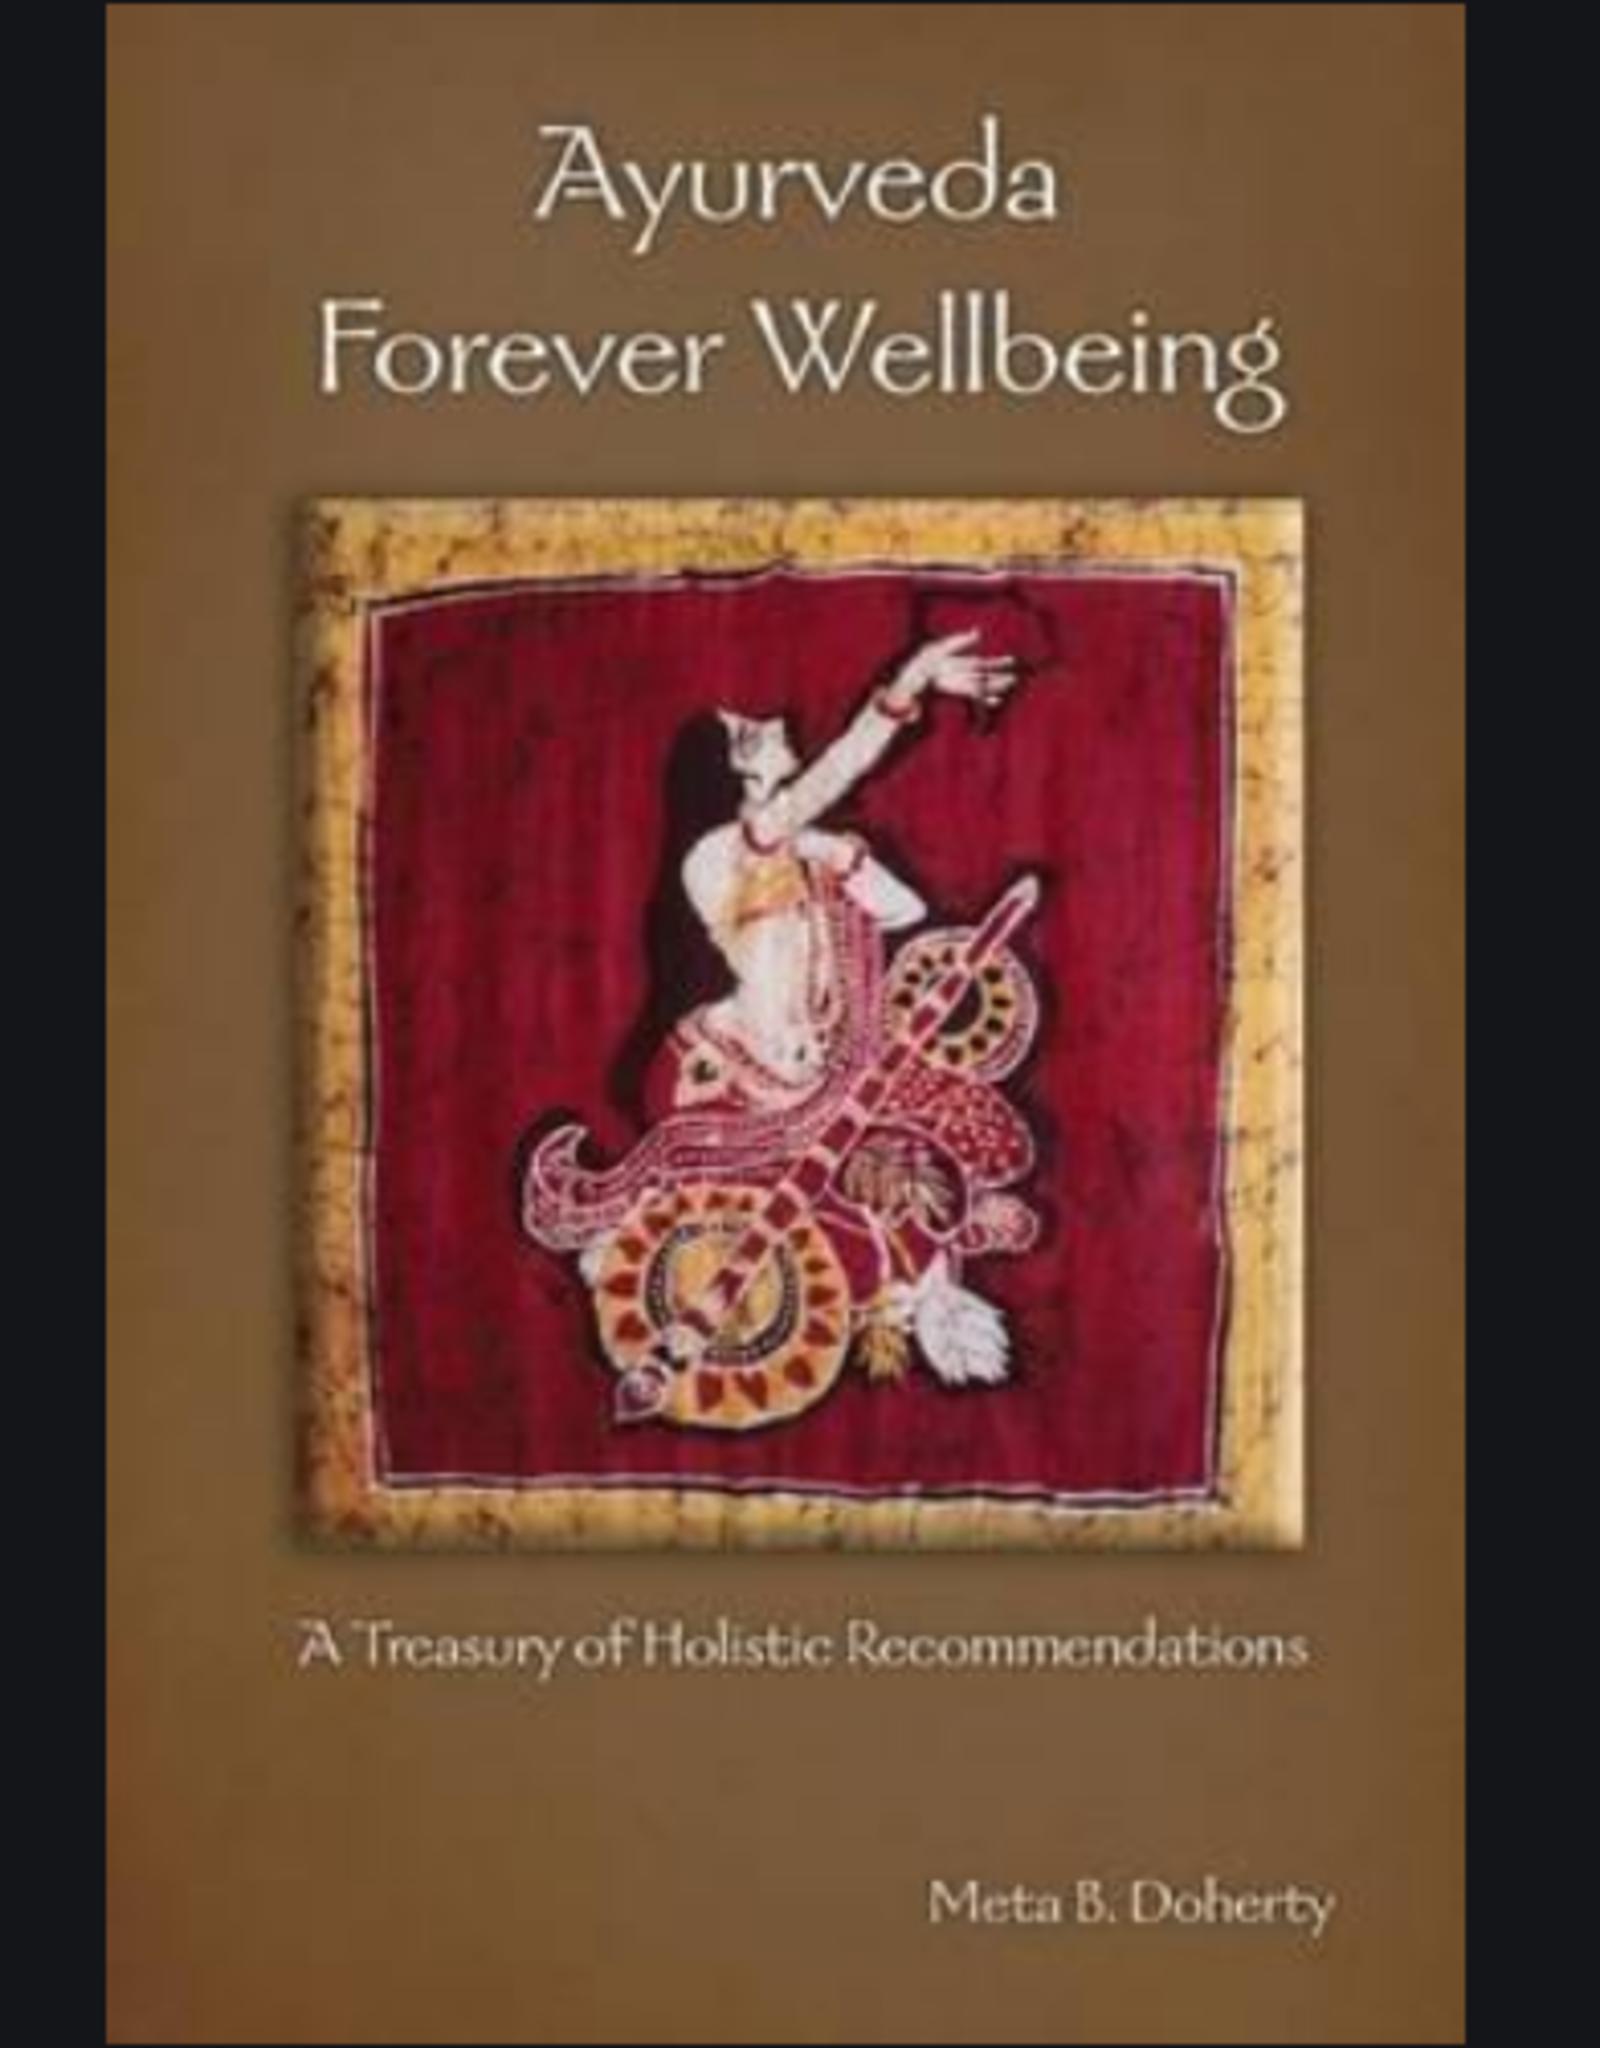 Meta B. Doherty Ayurveda Forever Wellbeing by Meta B. Doherty